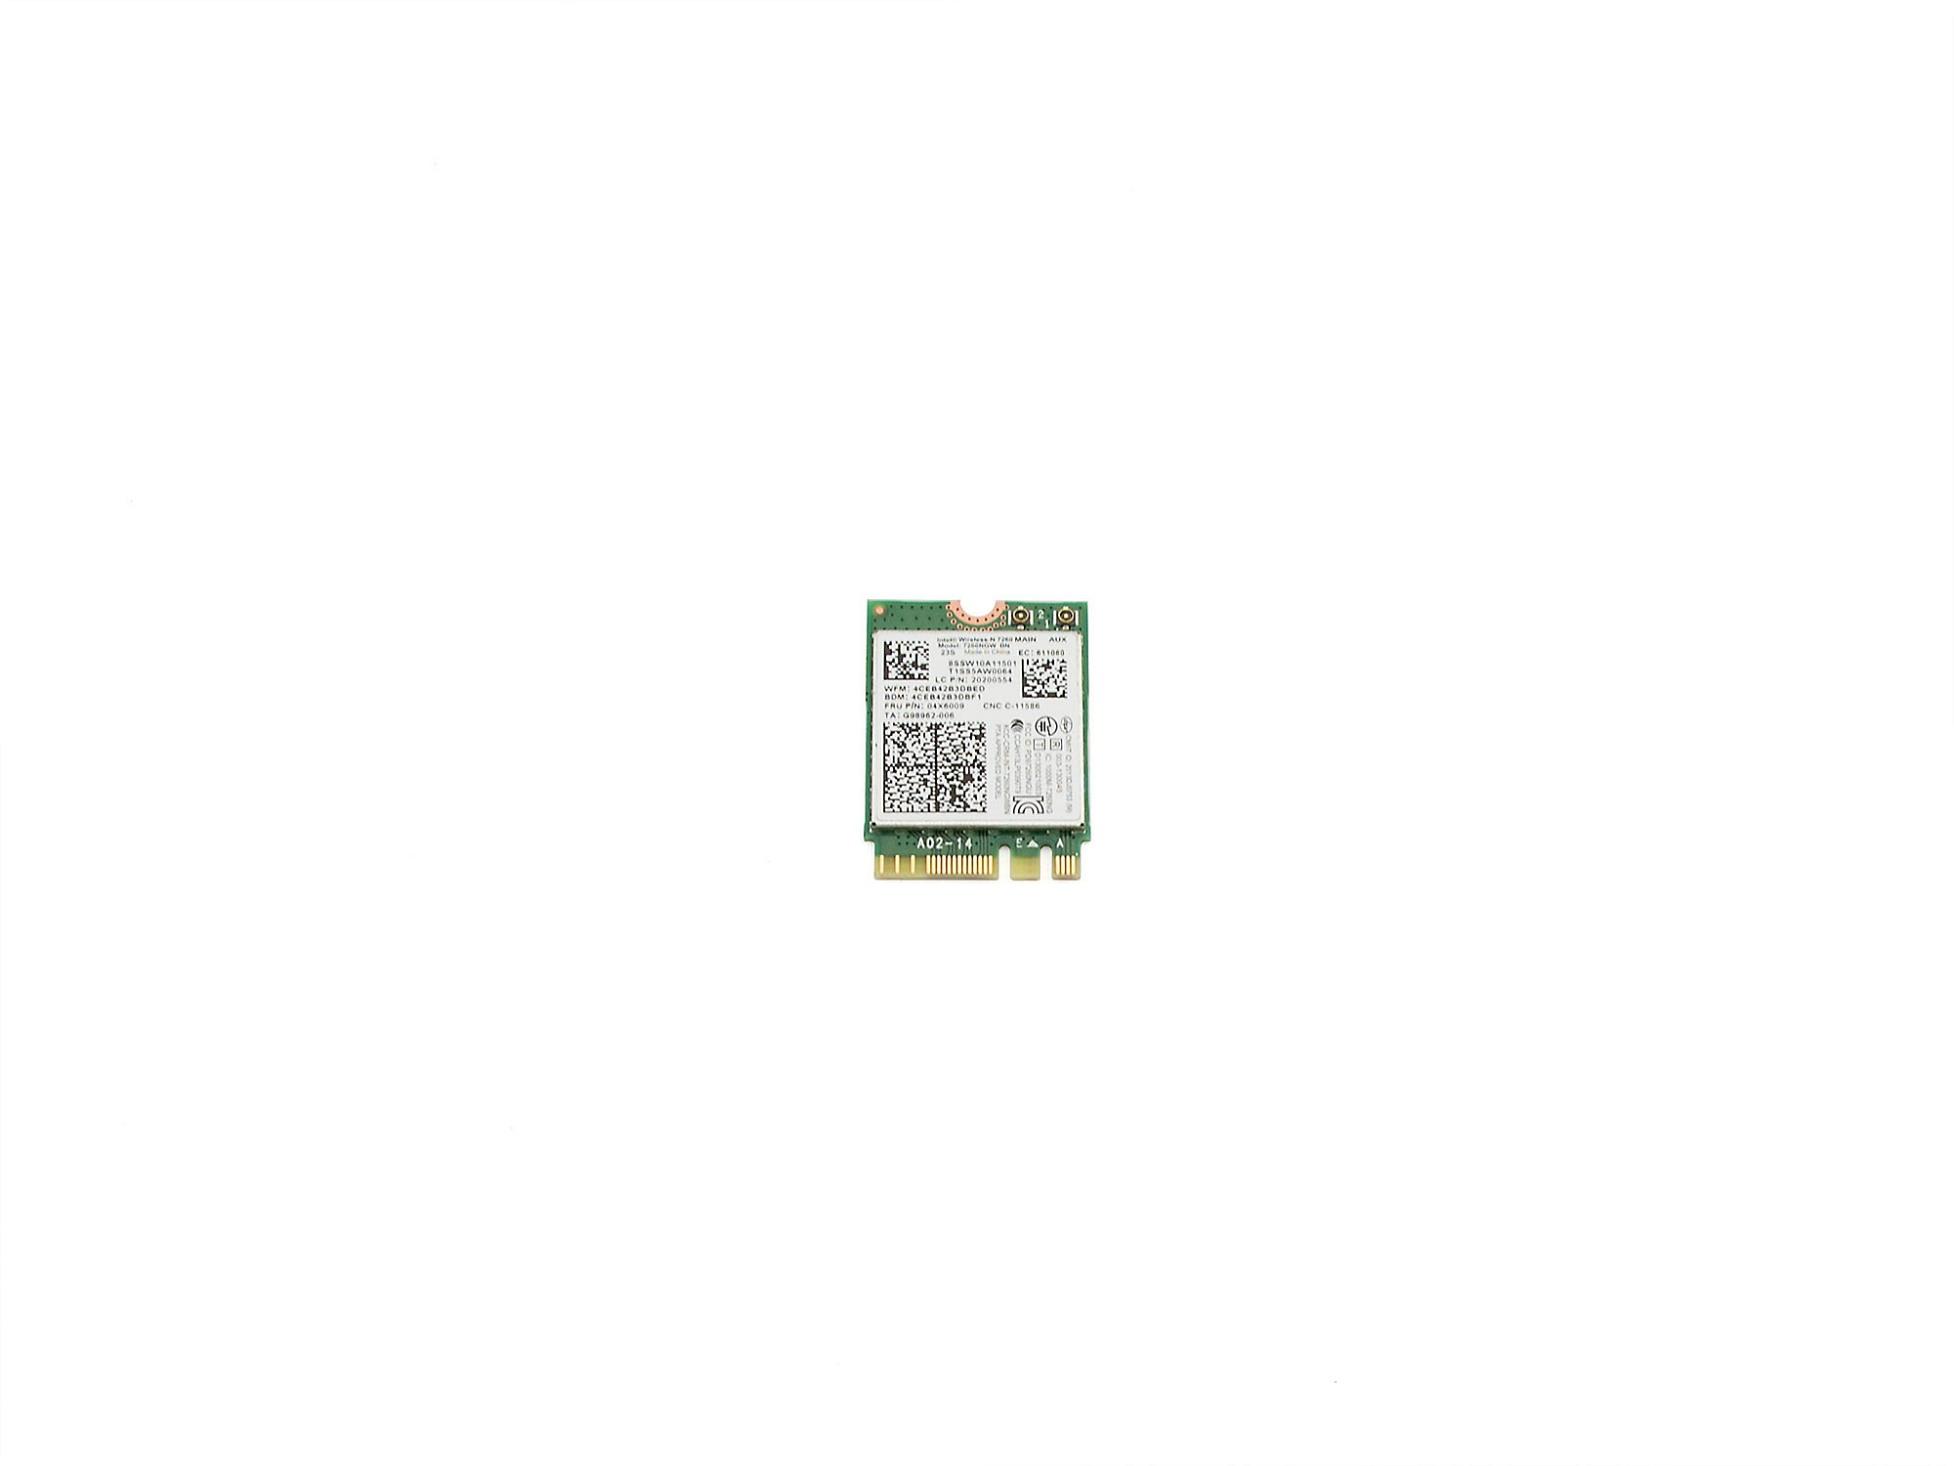 Intel Wireless-N 7260 MAIN für Lenovo Yoga 2 Pro 13 Serie